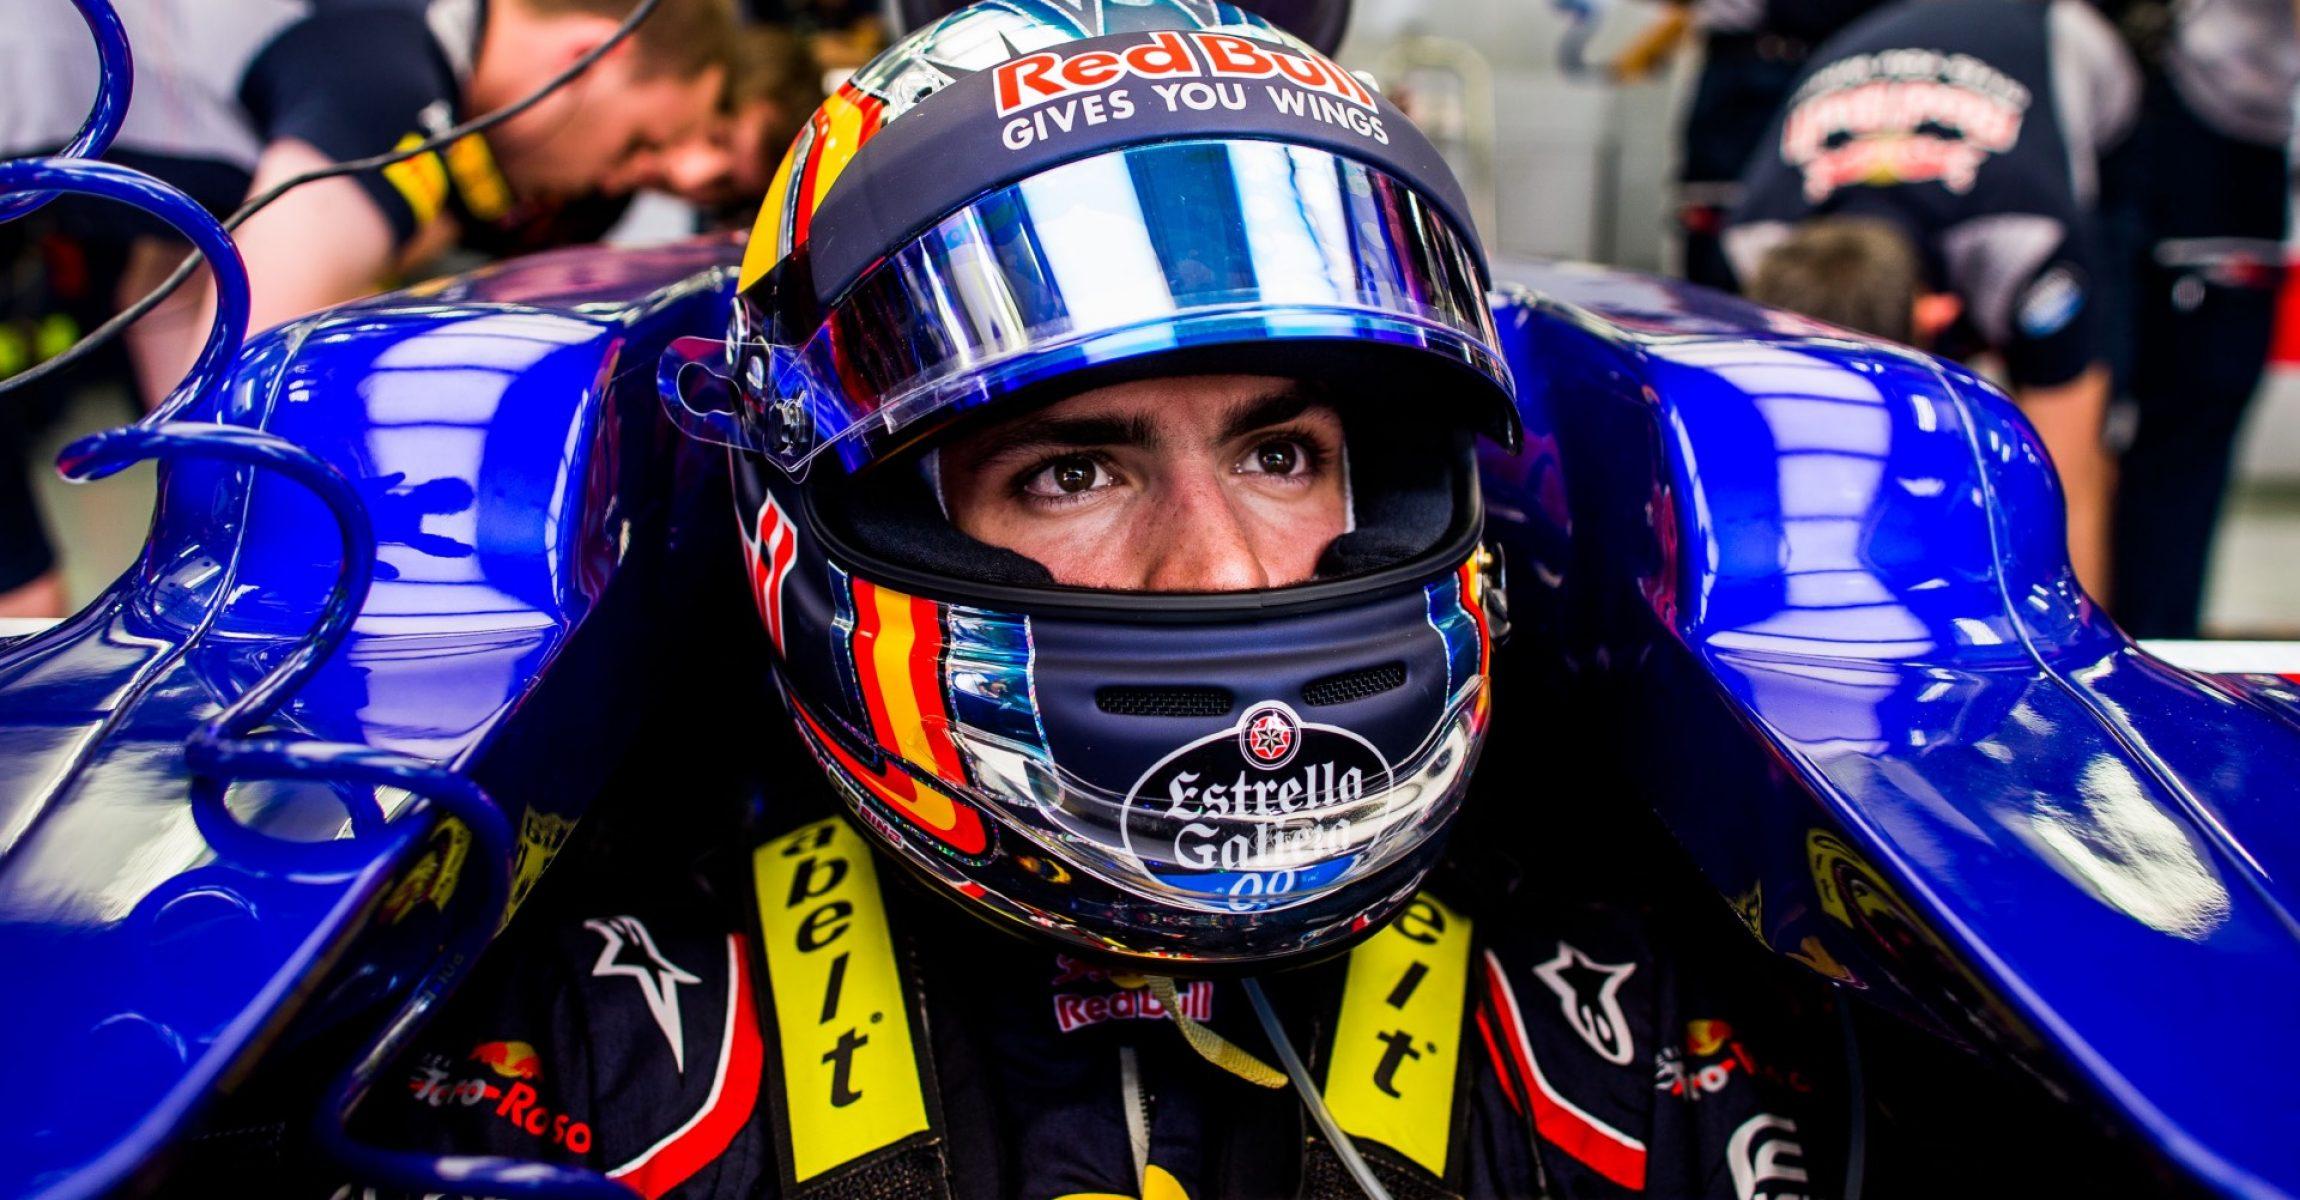 F1 Grand Prix of Bahrain - Qualifying